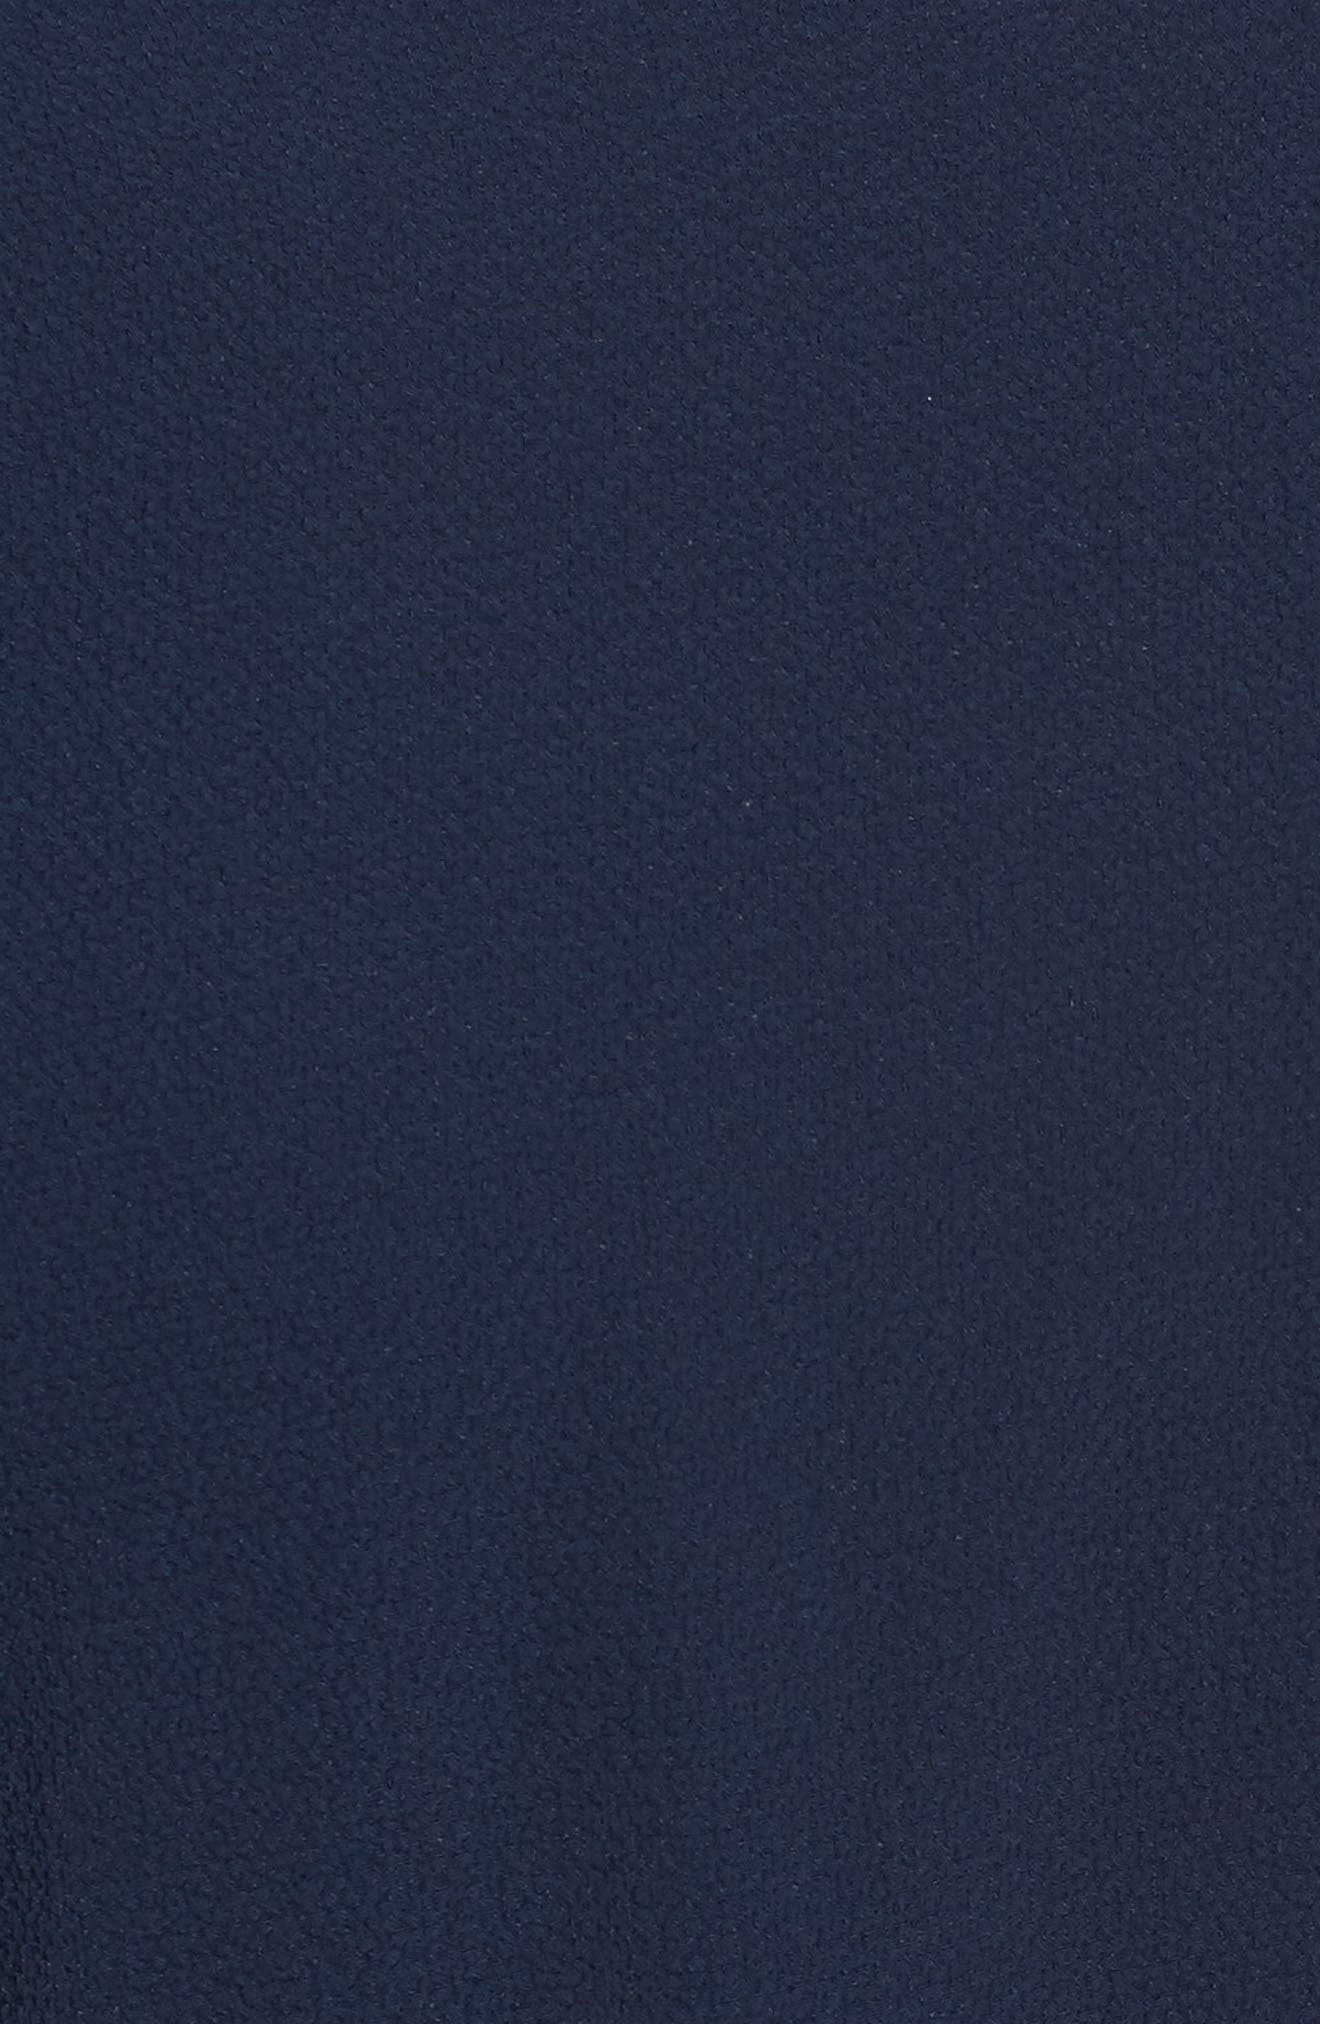 Stretch Crepe Dress,                             Alternate thumbnail 23, color,